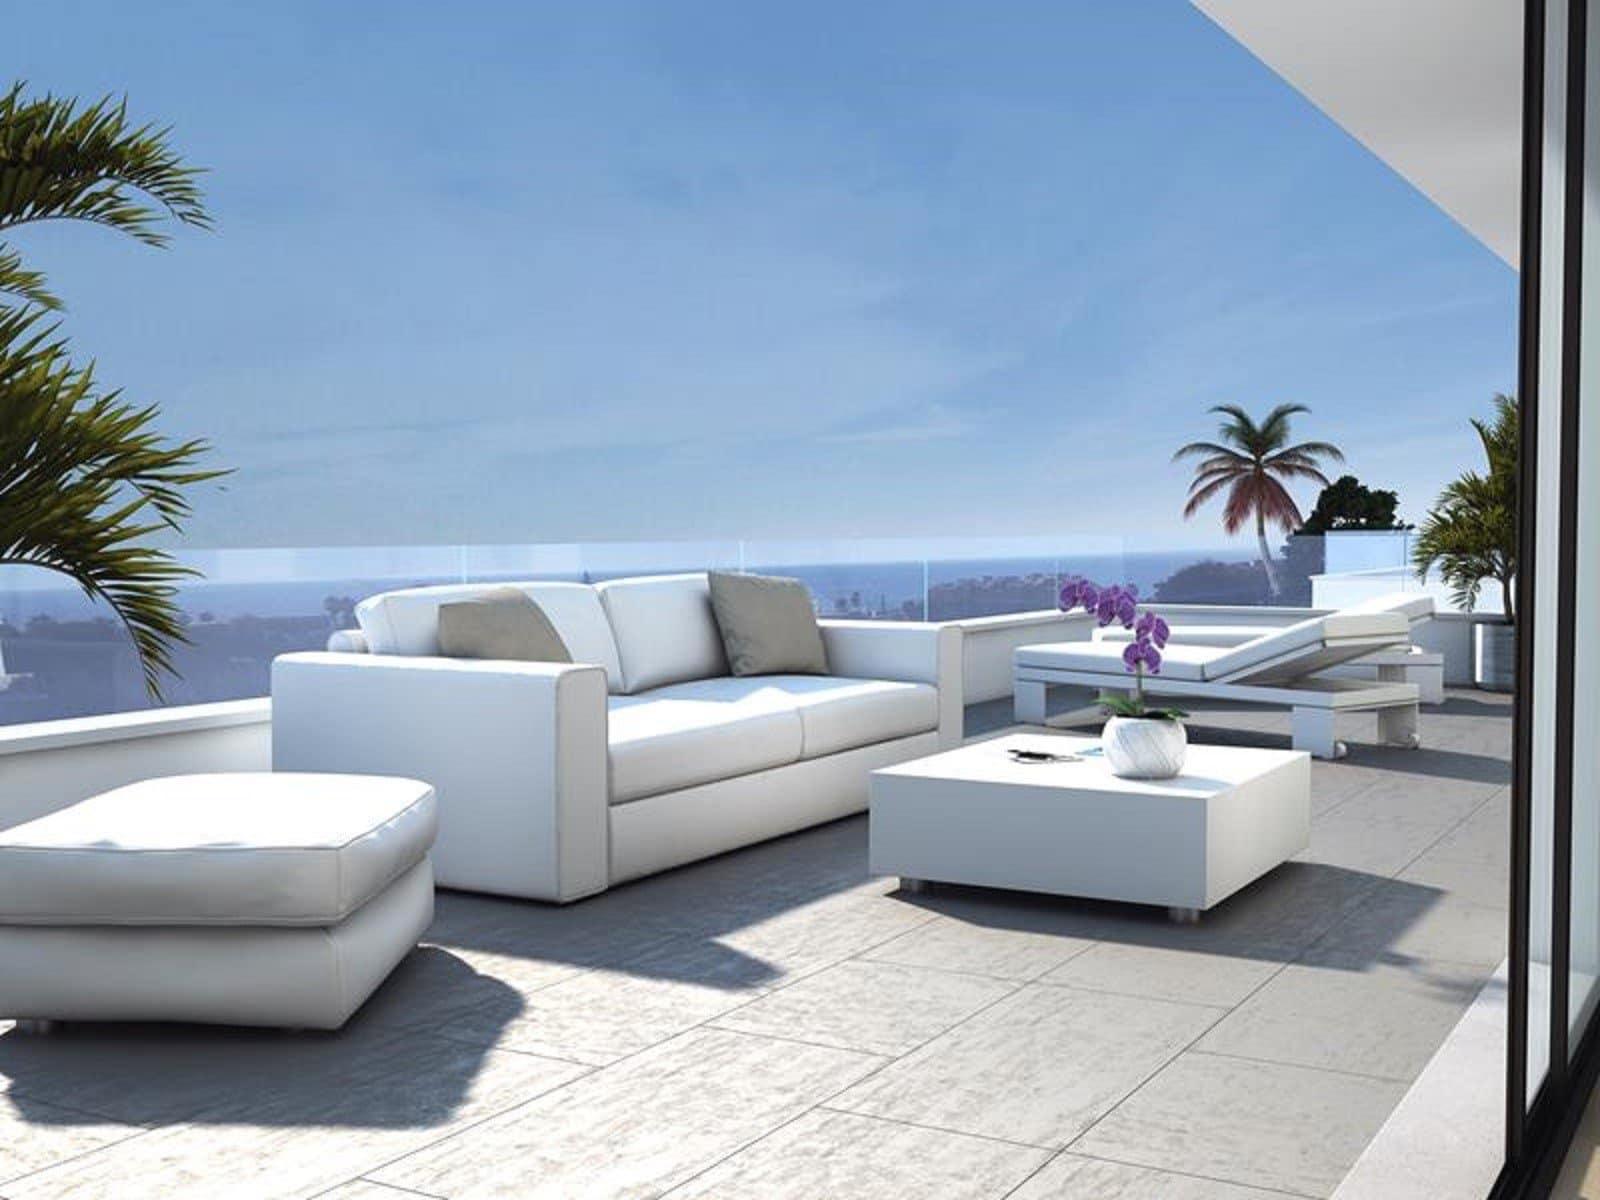 4 bedroom Villa for sale in Manilva with pool garage - € 548,000 (Ref: 4712159)